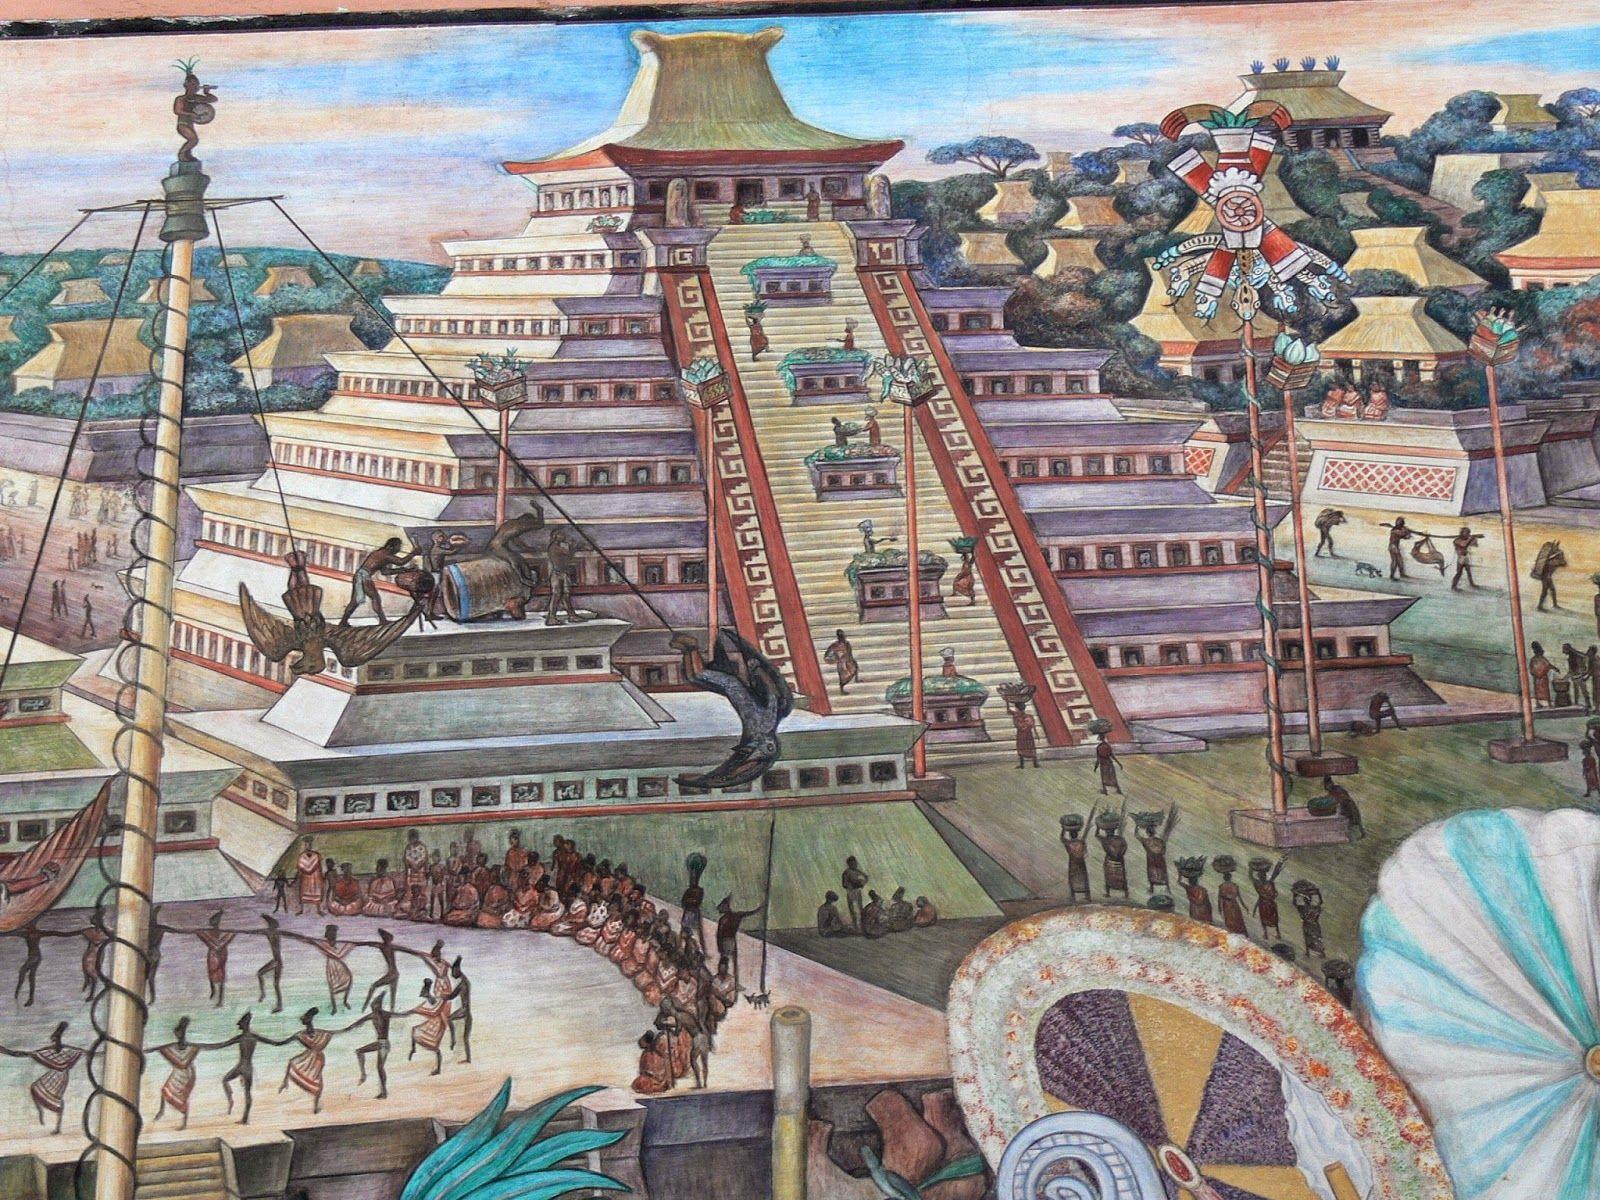 Murales Rivera Indianer Vor Tenochtitlan Pyramide 28129murales Diego De